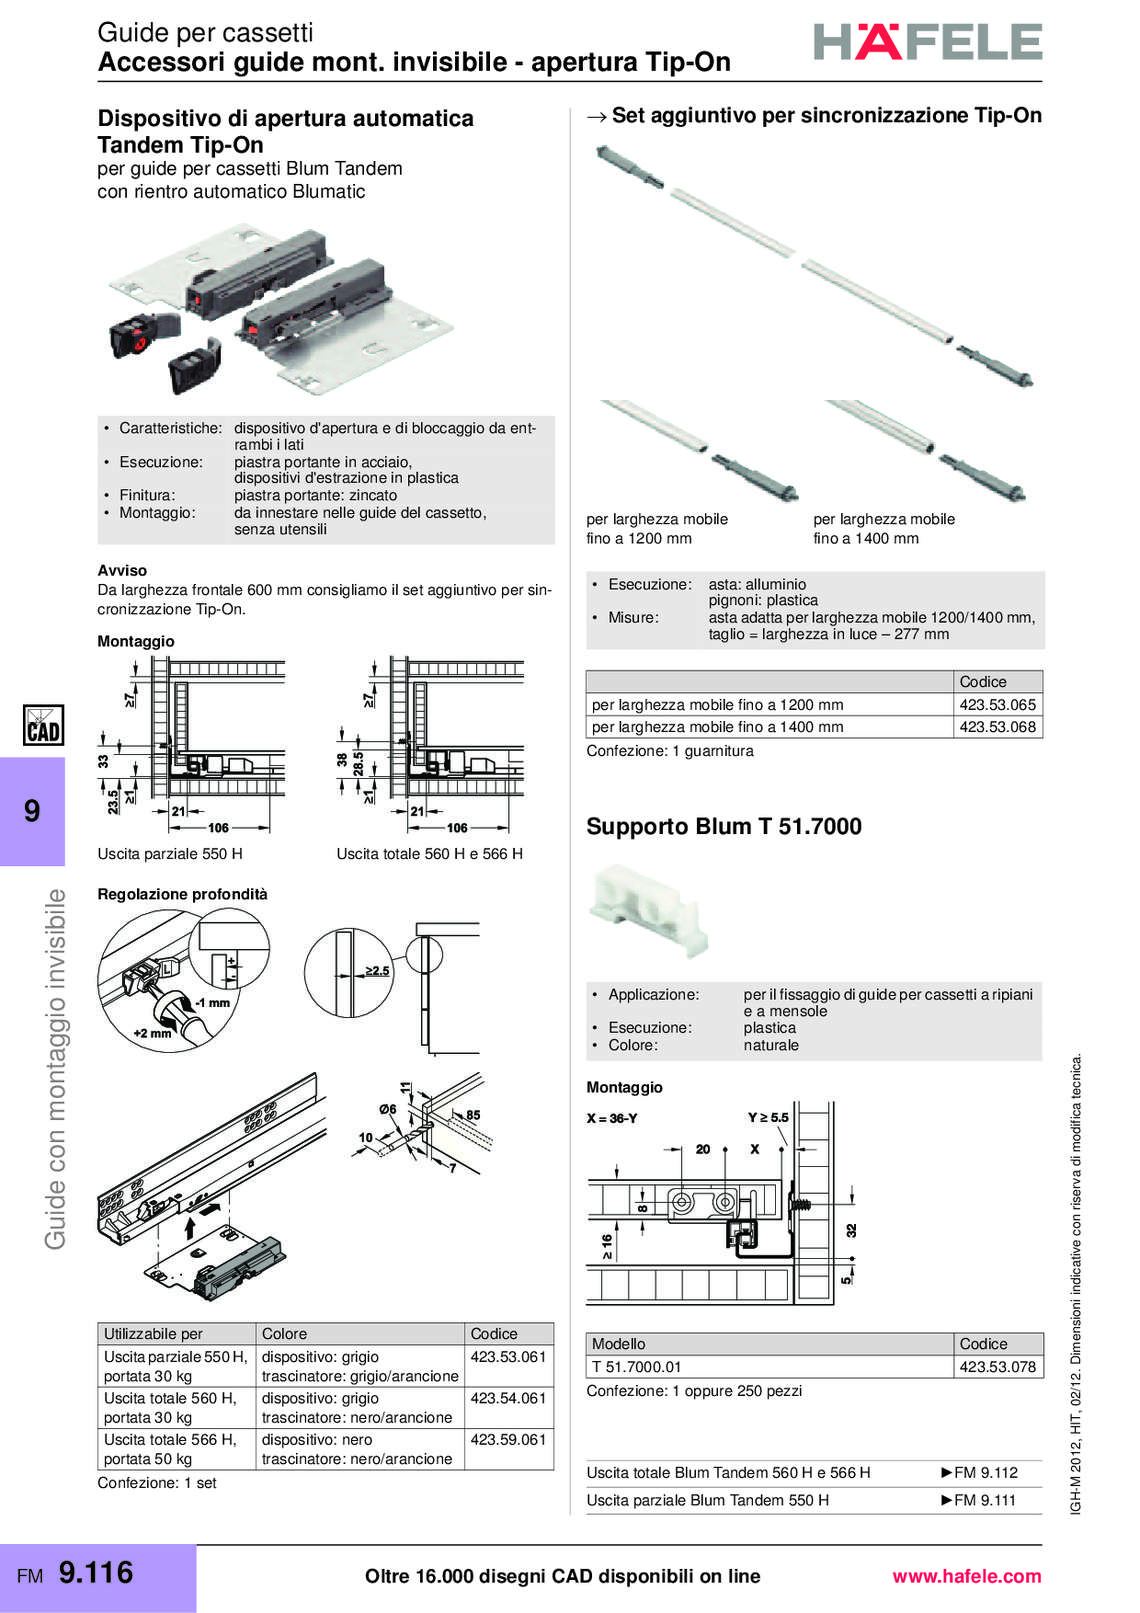 hafele-spondine-e-guide-per-mobili_40_165.jpg